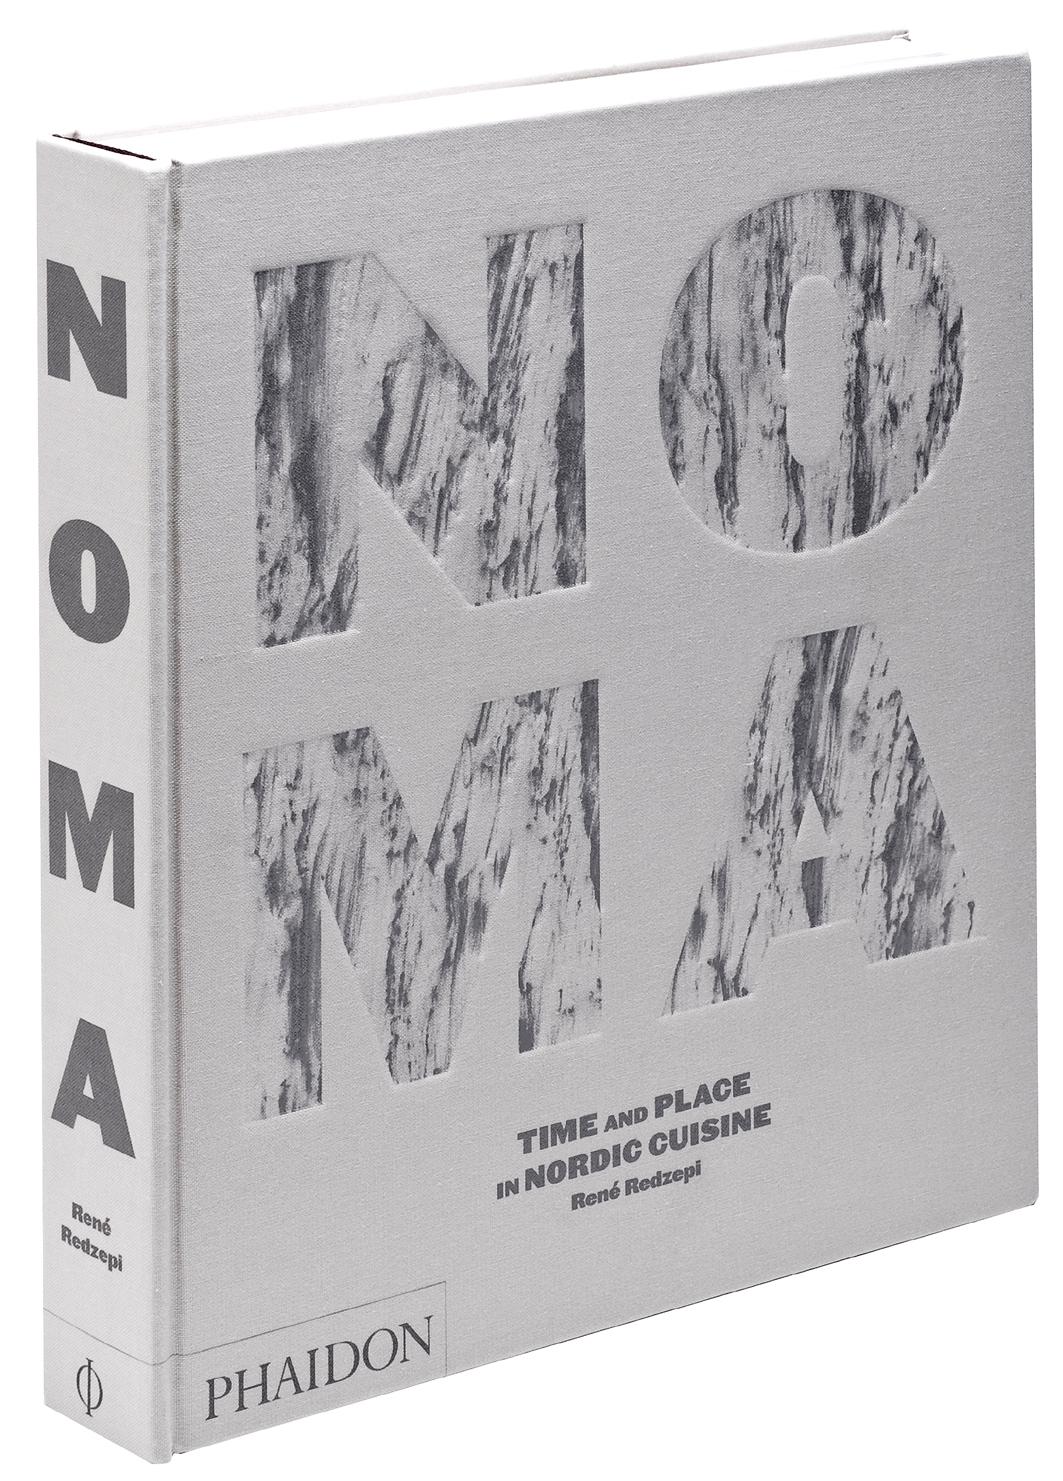 Cookbook Review: NOMA by Rene Redzepi